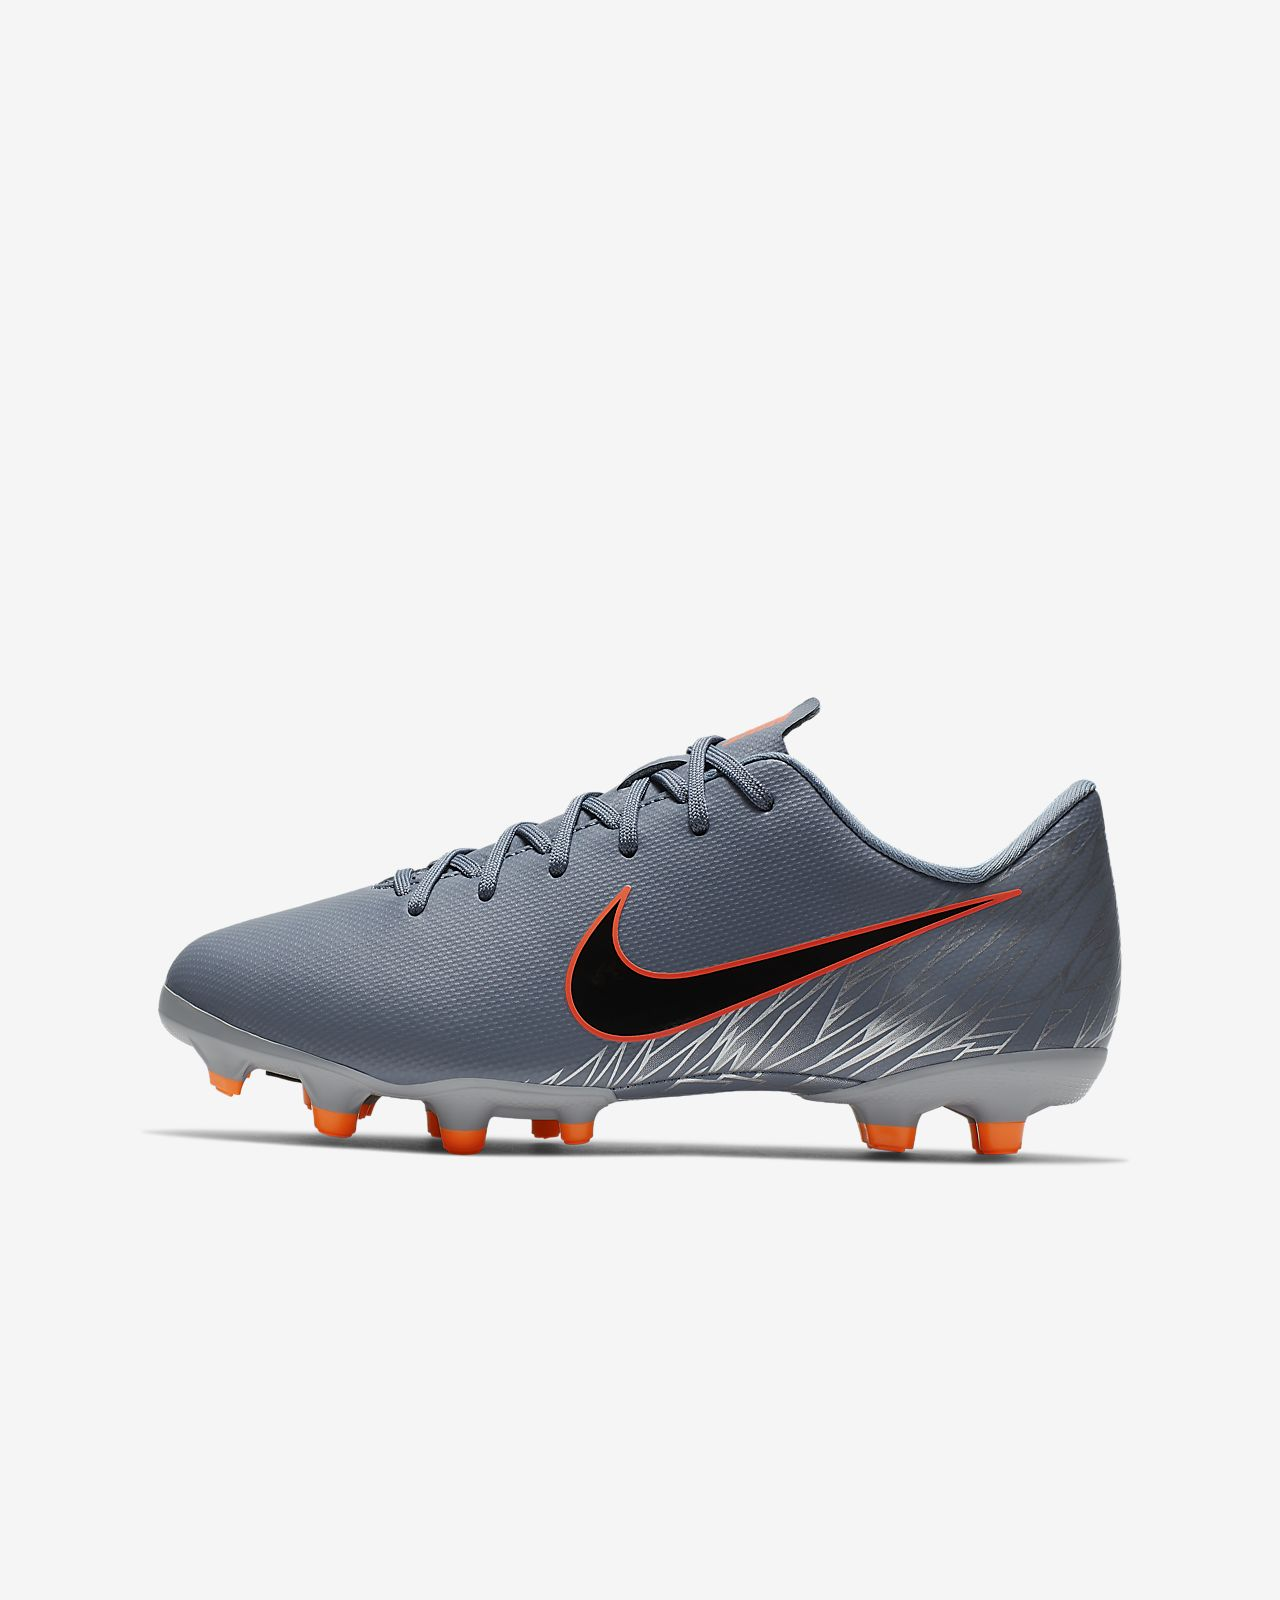 Nike Jr. Mercurial Vapor XII Academy Botas de fútbol para múltiples superficies - Niño/a y niño/a pequeño/a